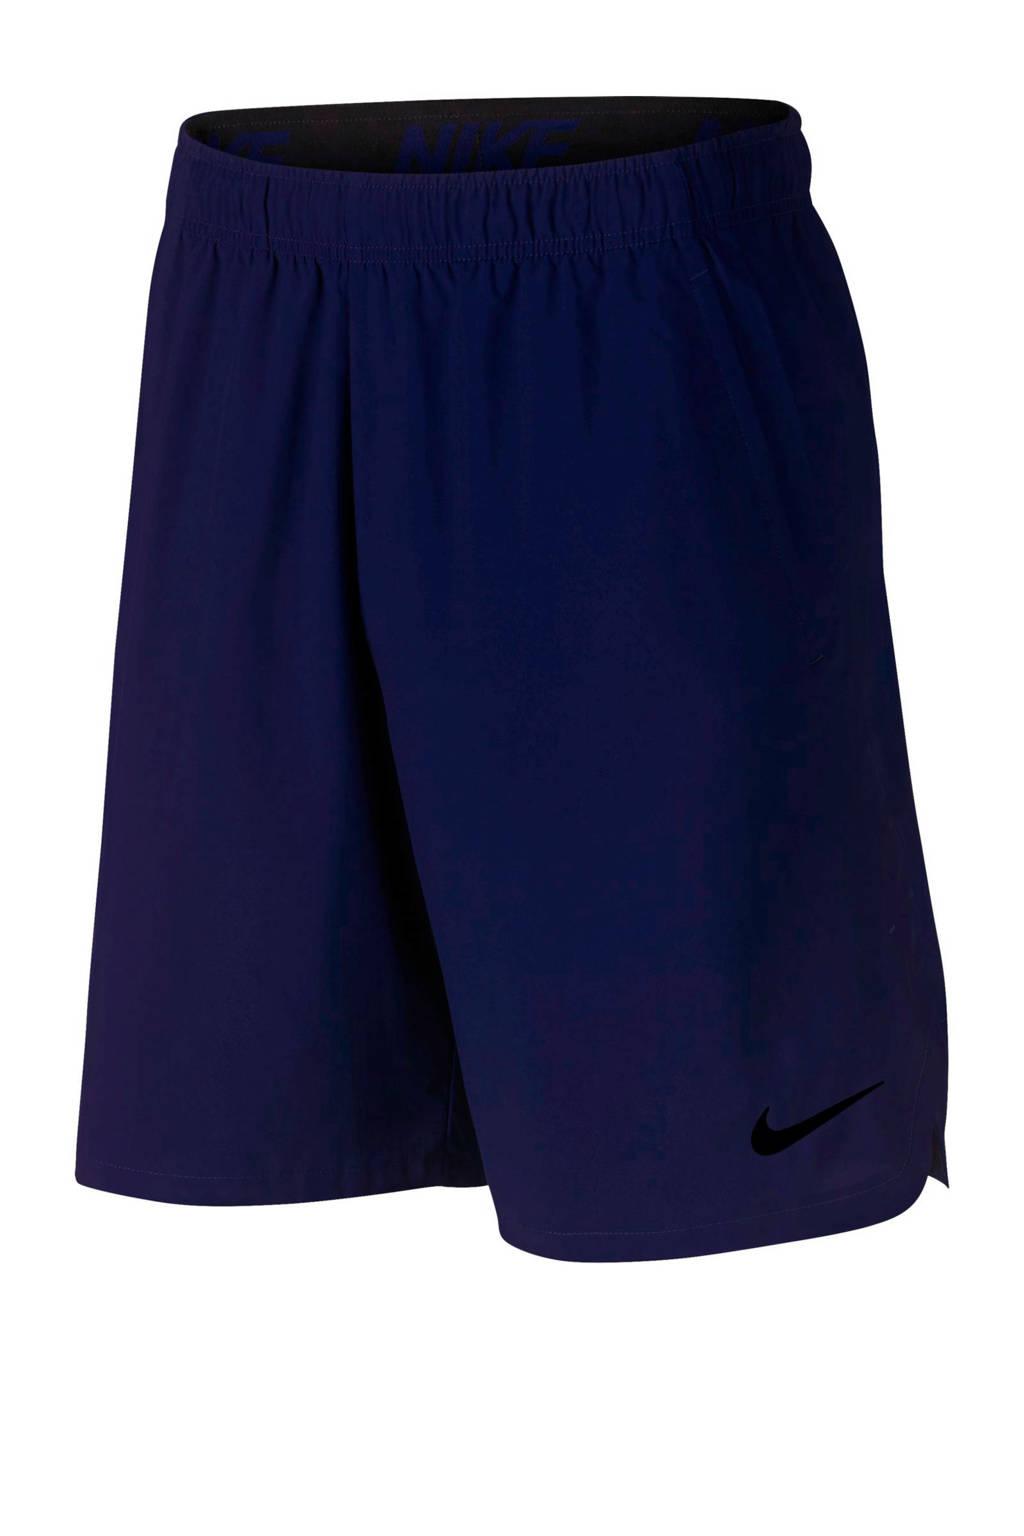 Nike   sportshort donkerblauw, Donkerblauw